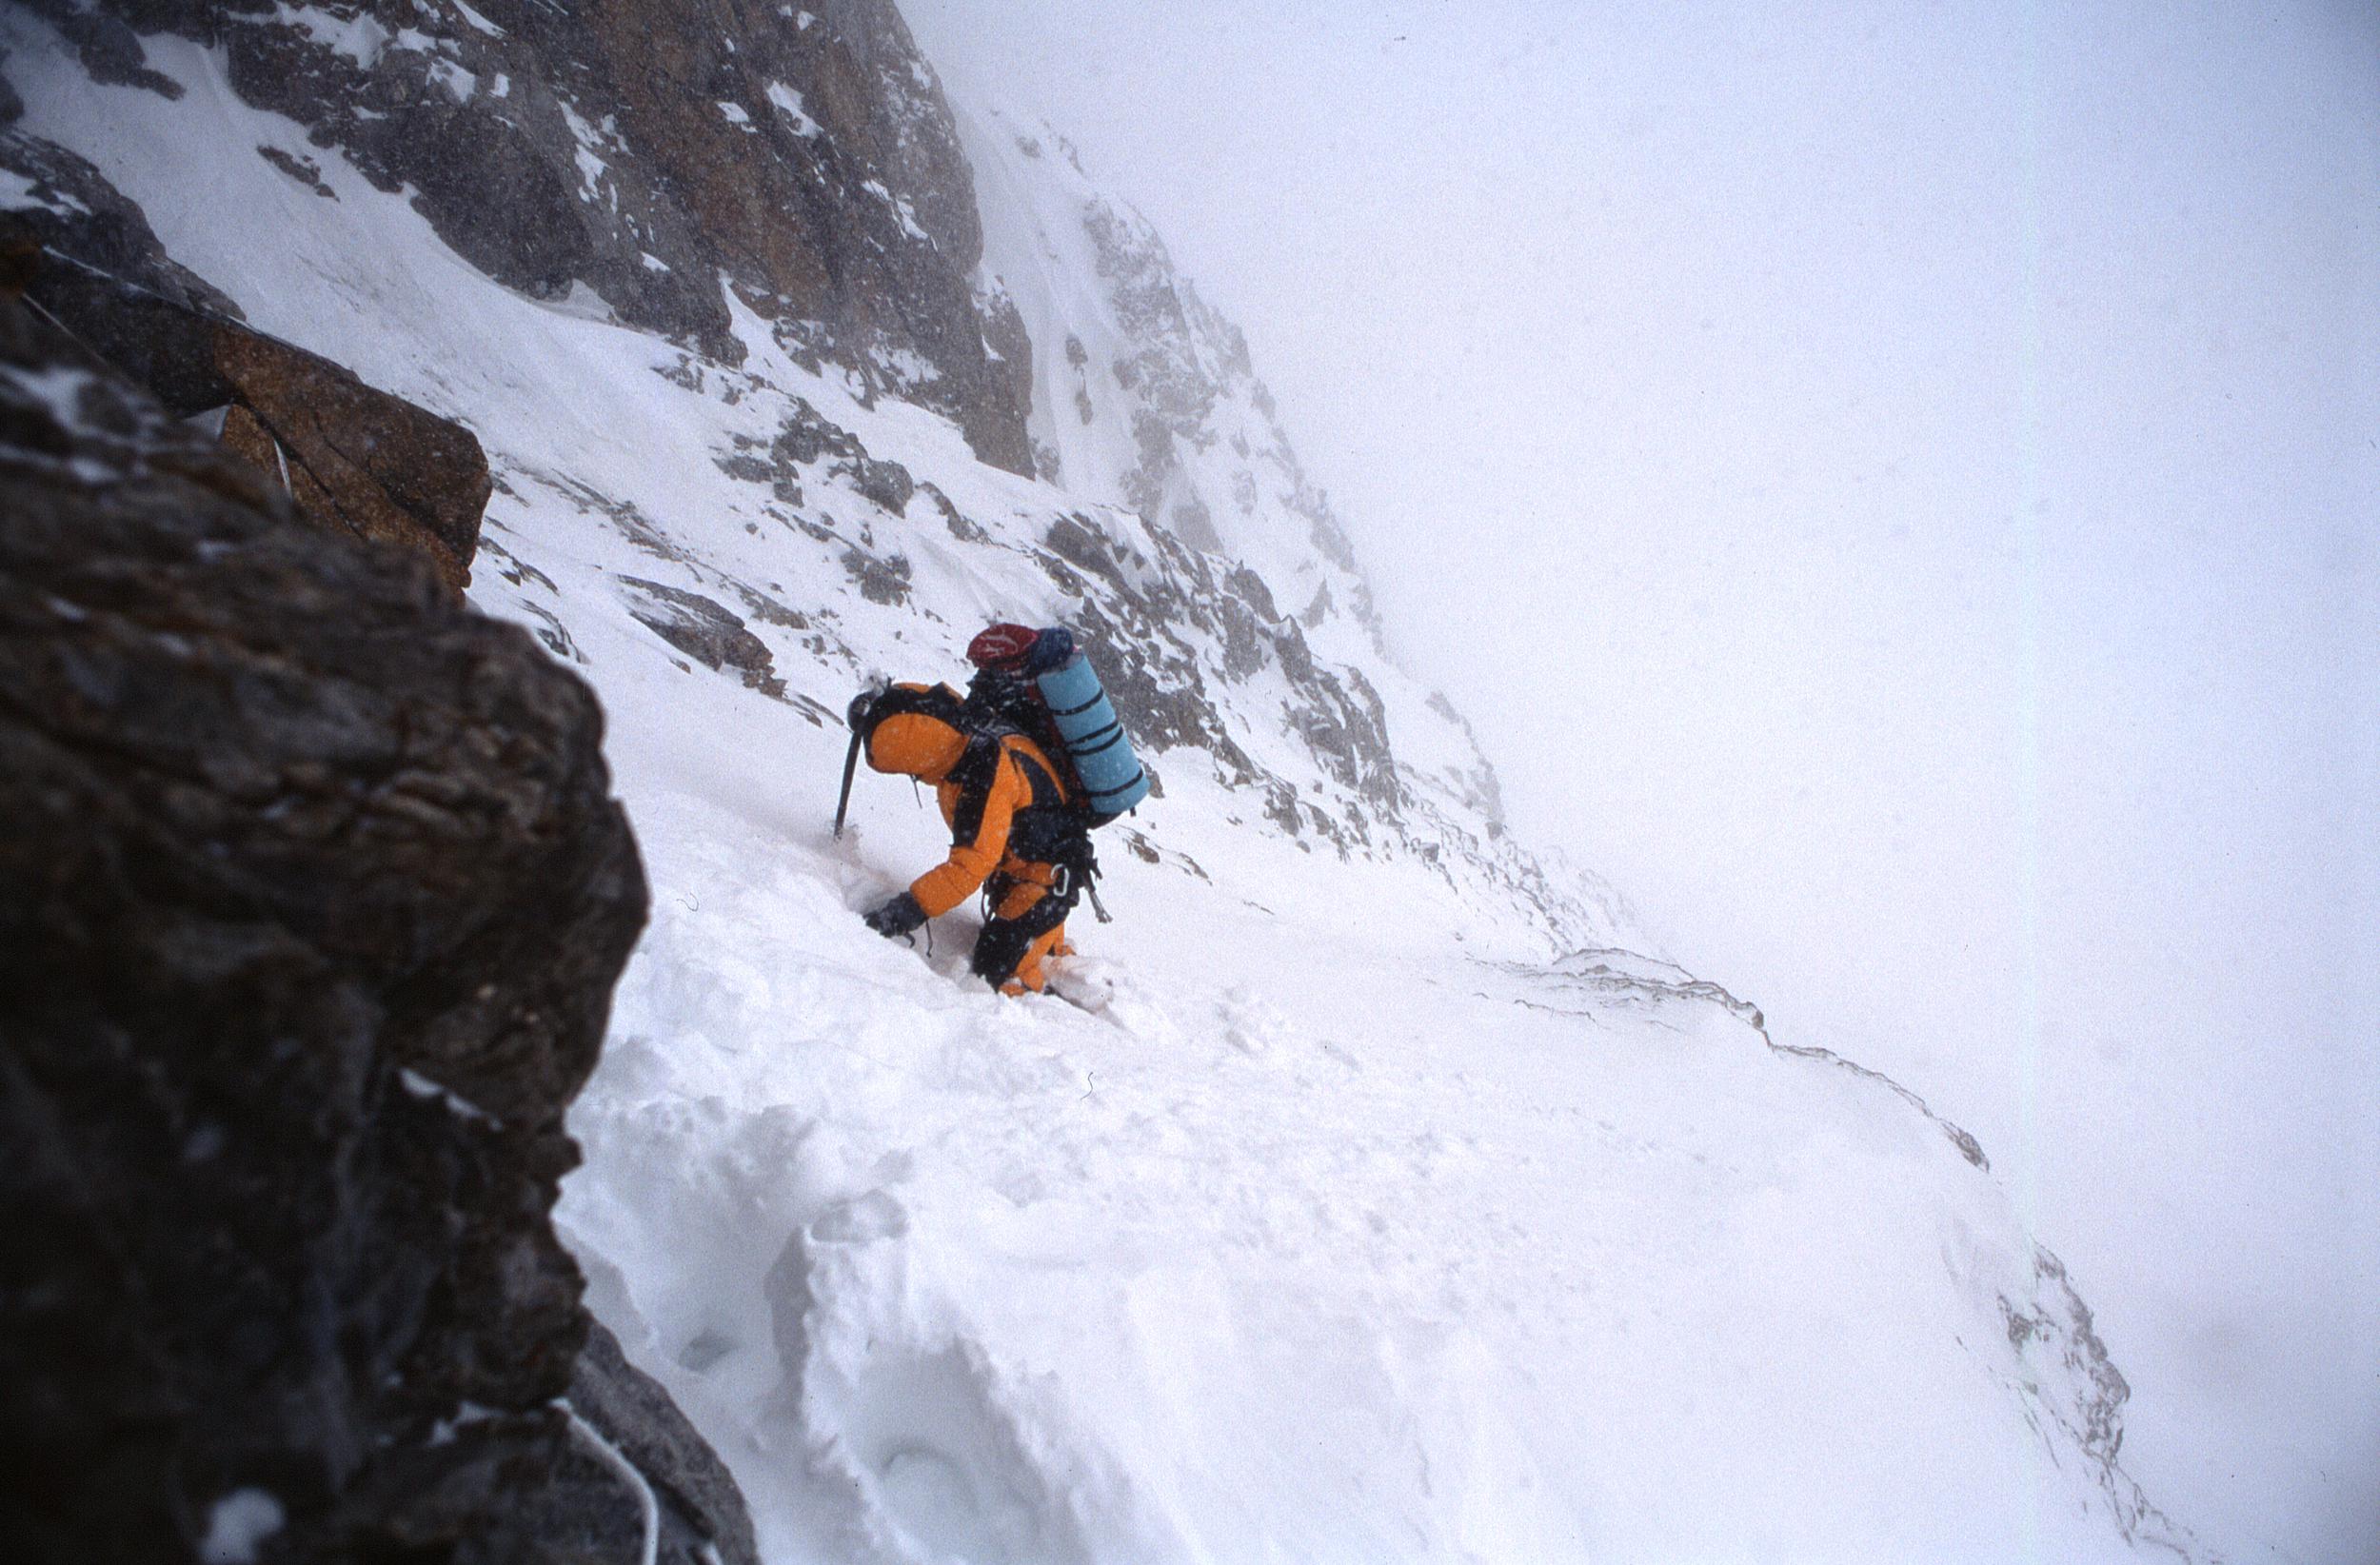 Epic retreat off the northwest ridge.